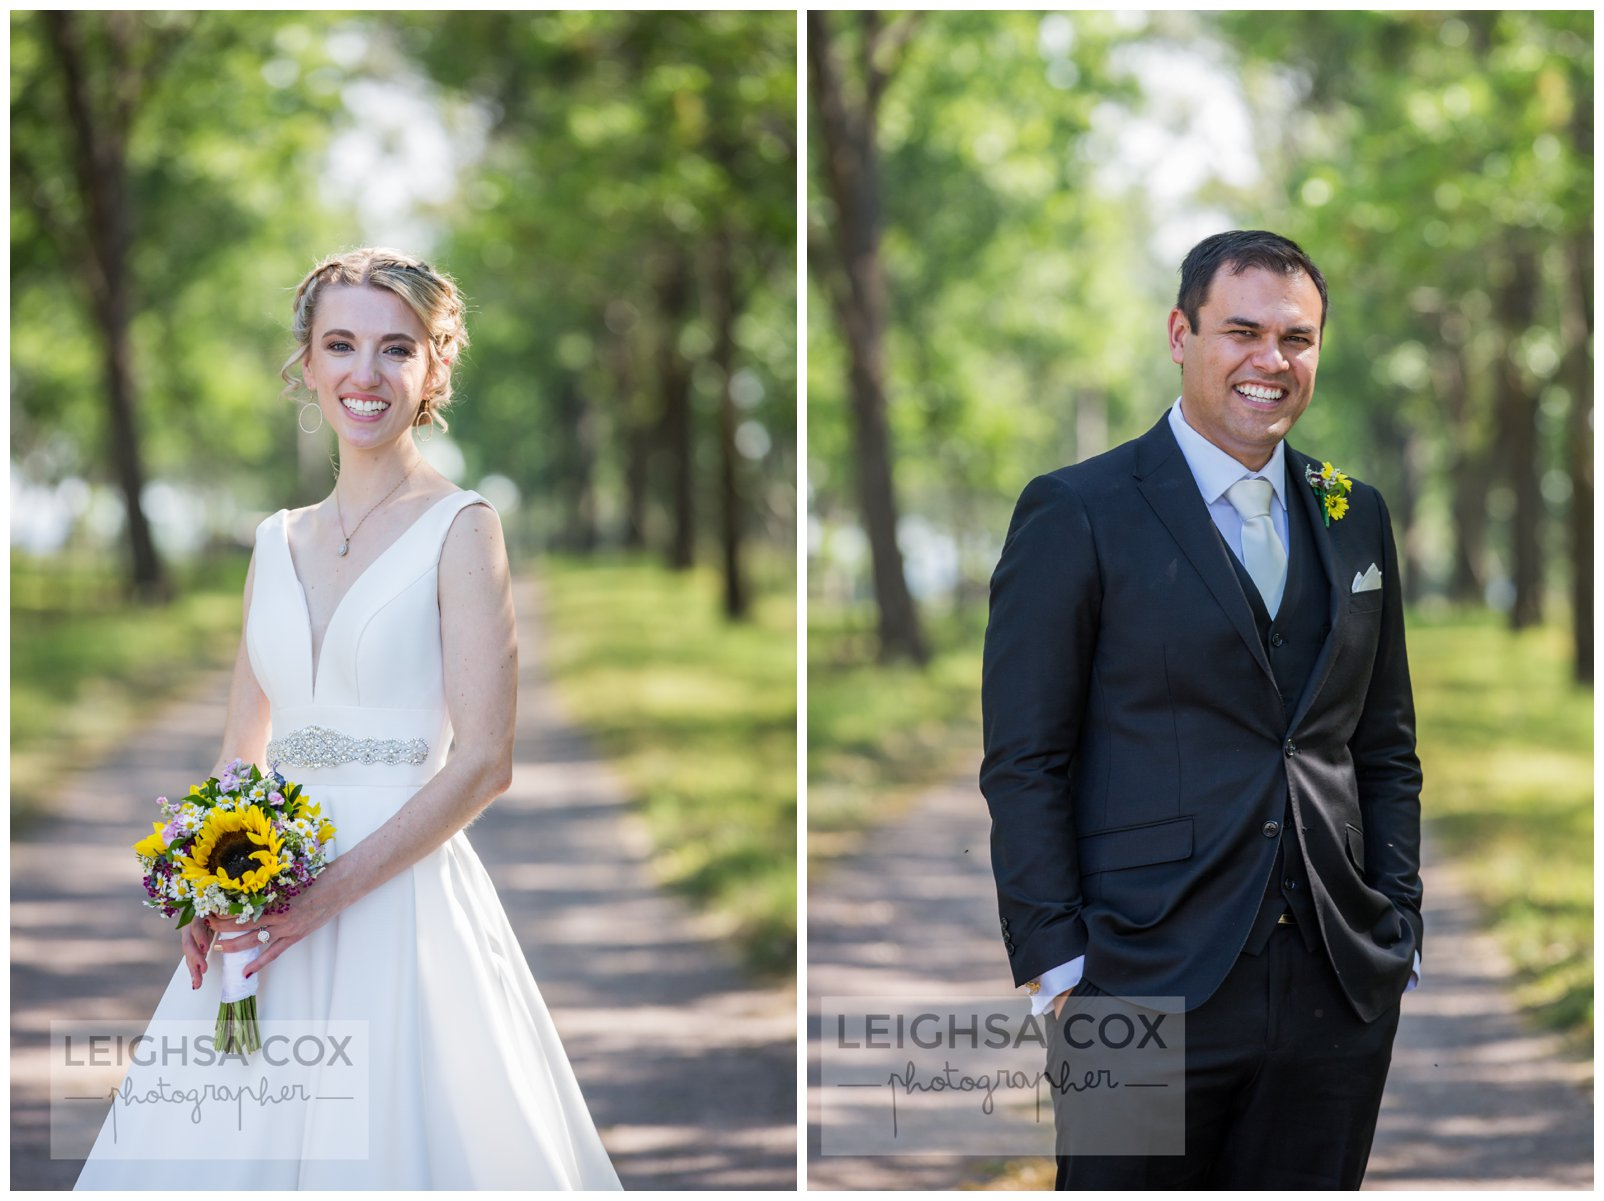 Woodville bride and groom